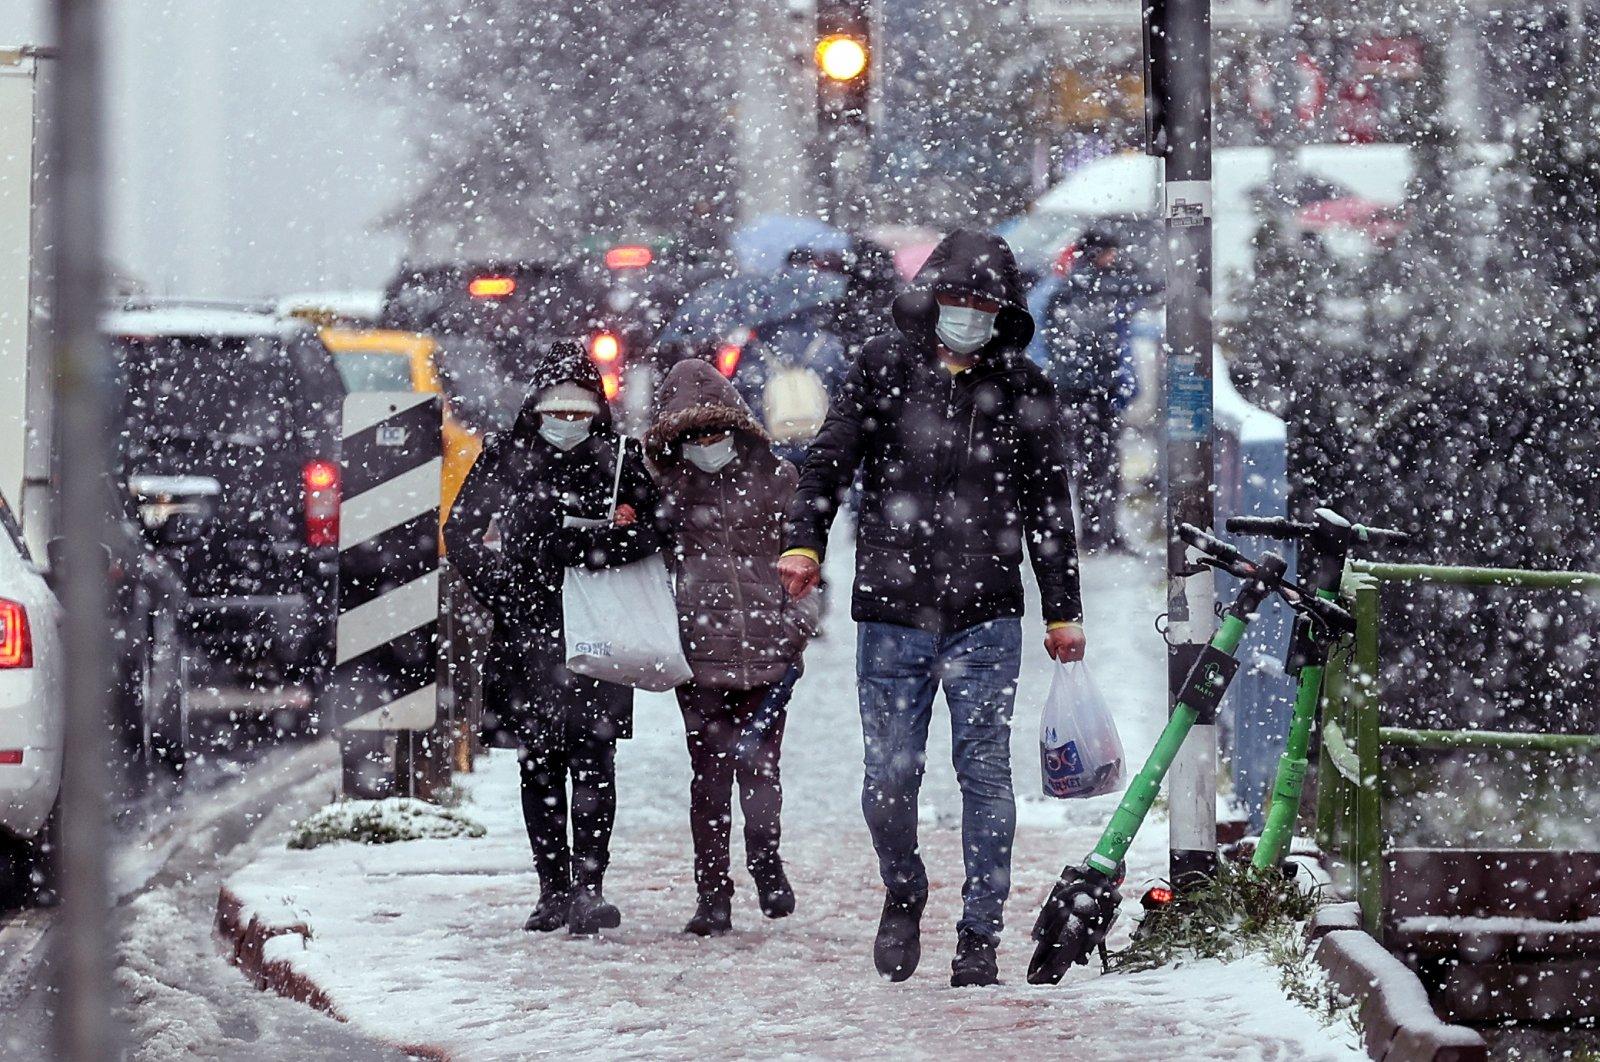 People walk in a street as heavy snowfall hits the Okmeydanı neighborhood in Istanbul, Turkey, March 24, 2021. (AA PHOTO)